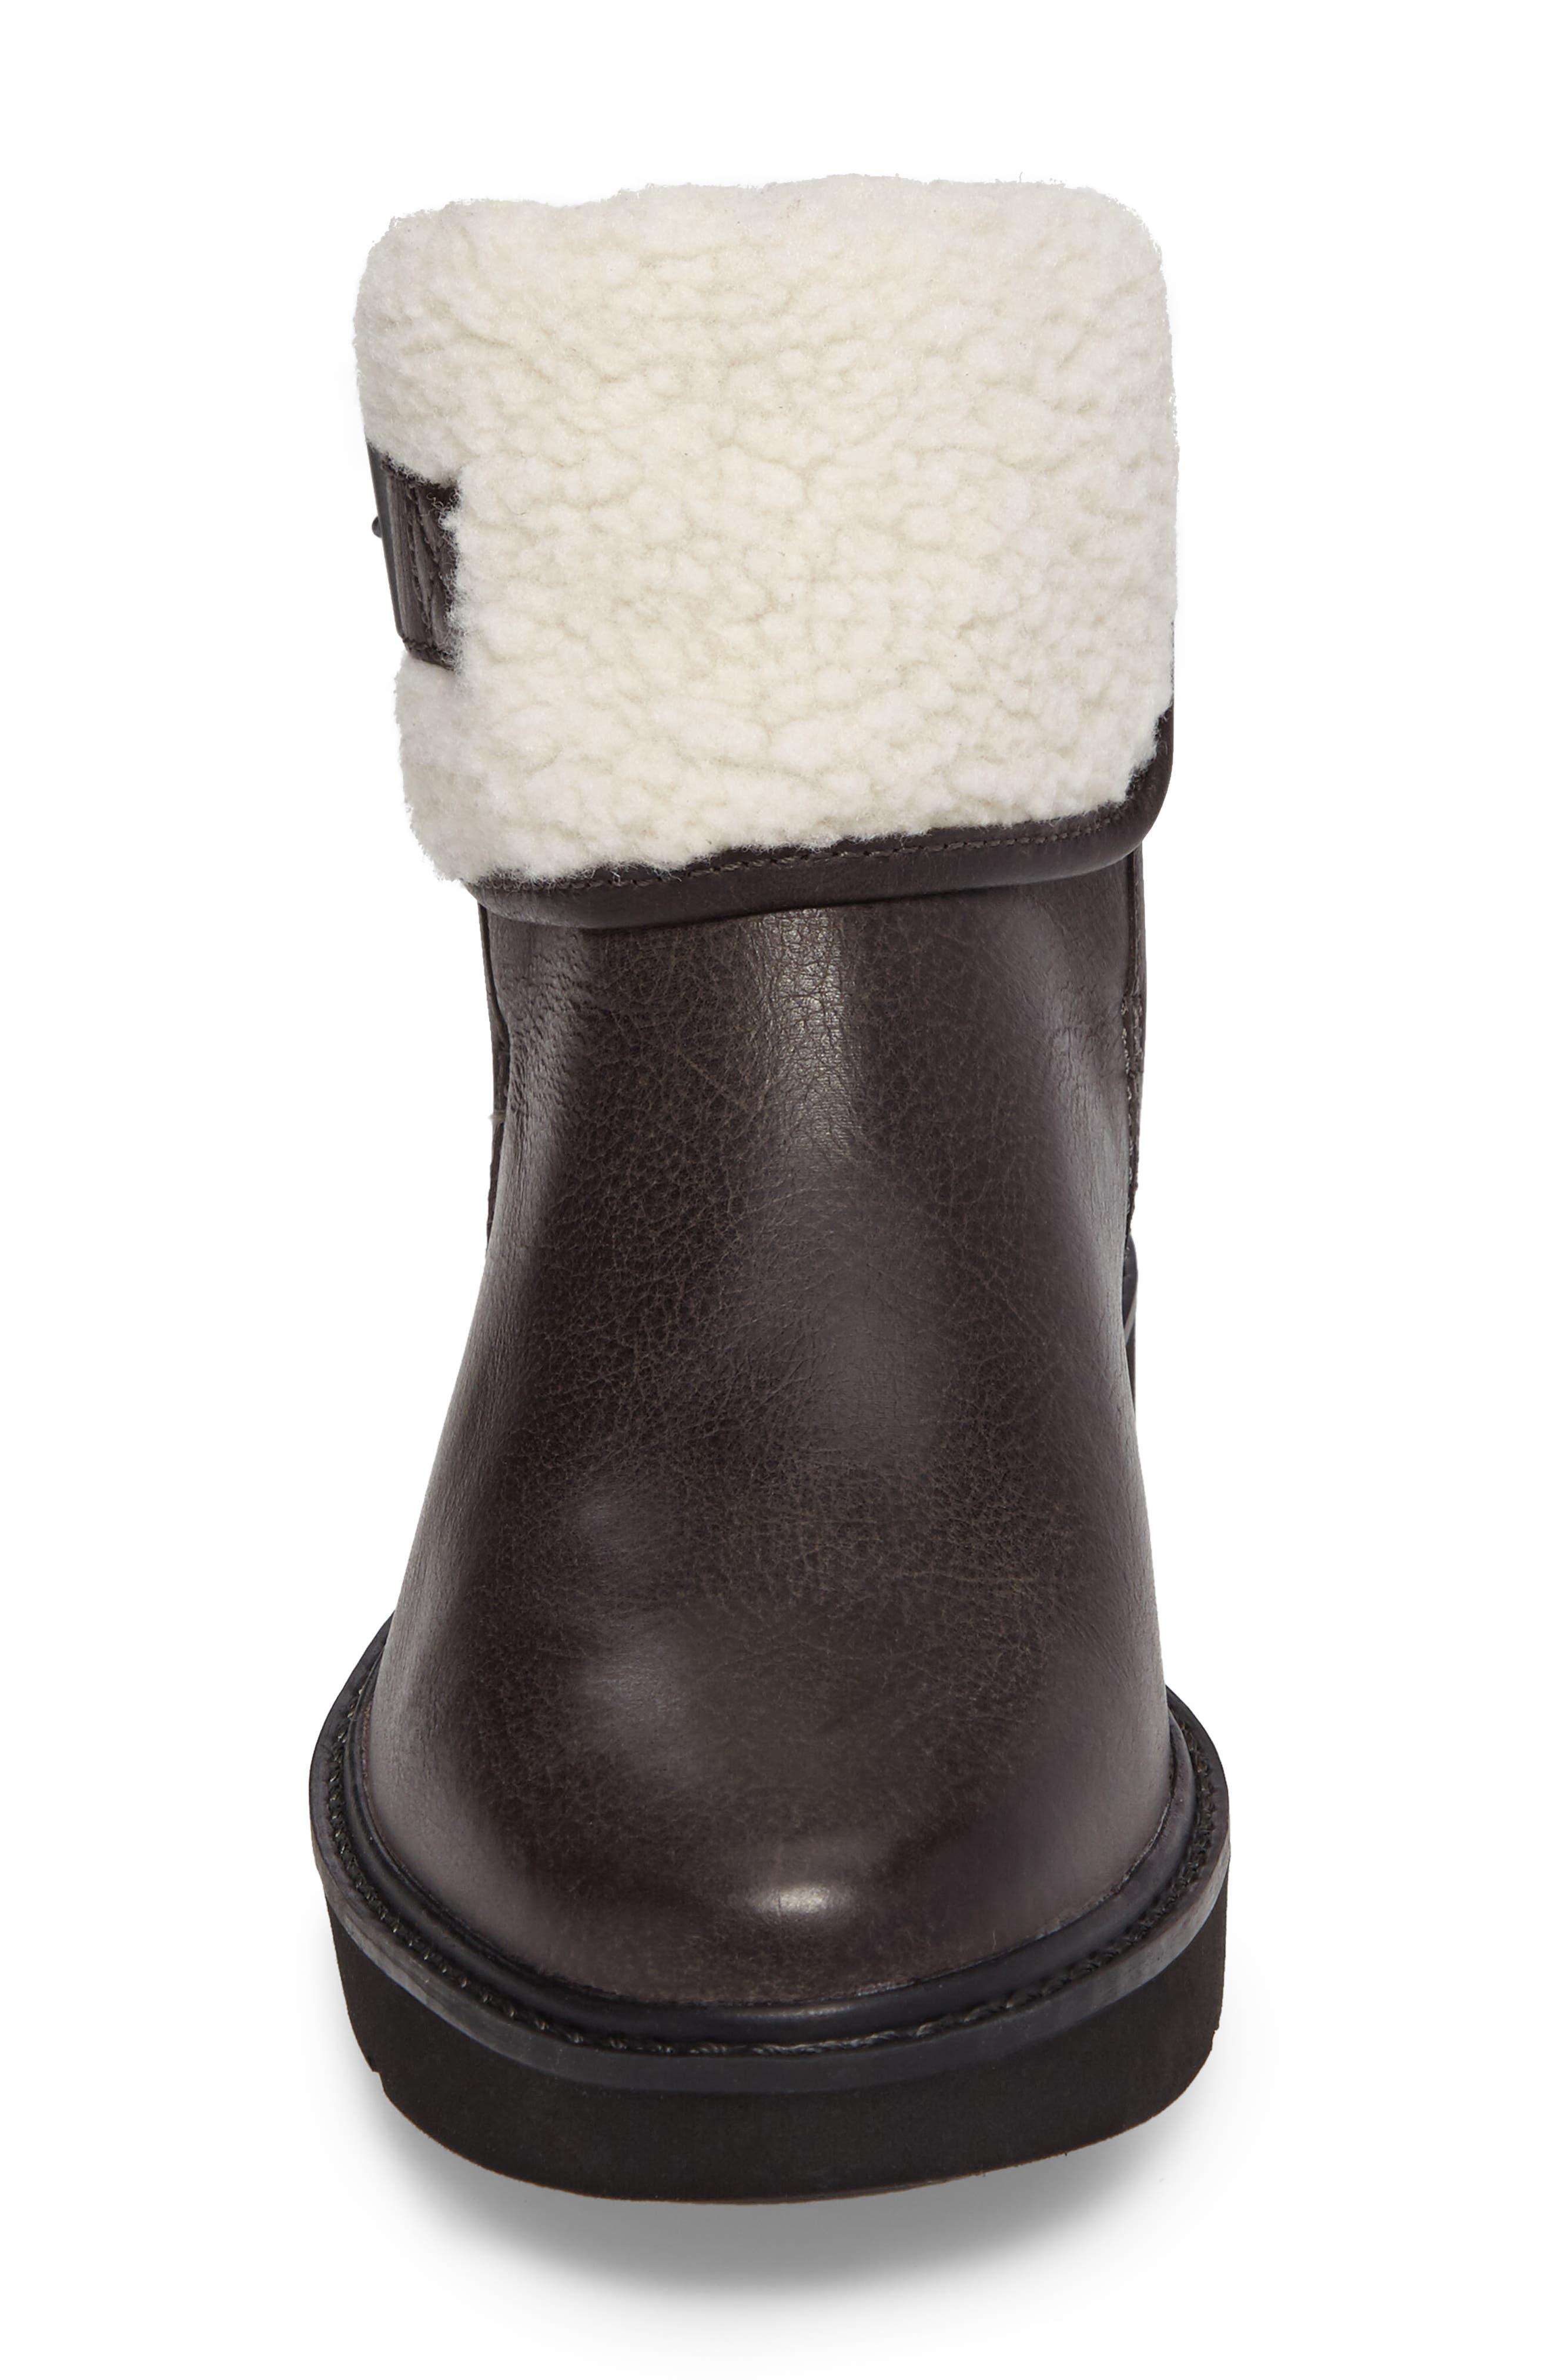 Kenniston Fleece Lined Boot,                             Alternate thumbnail 4, color,                             021